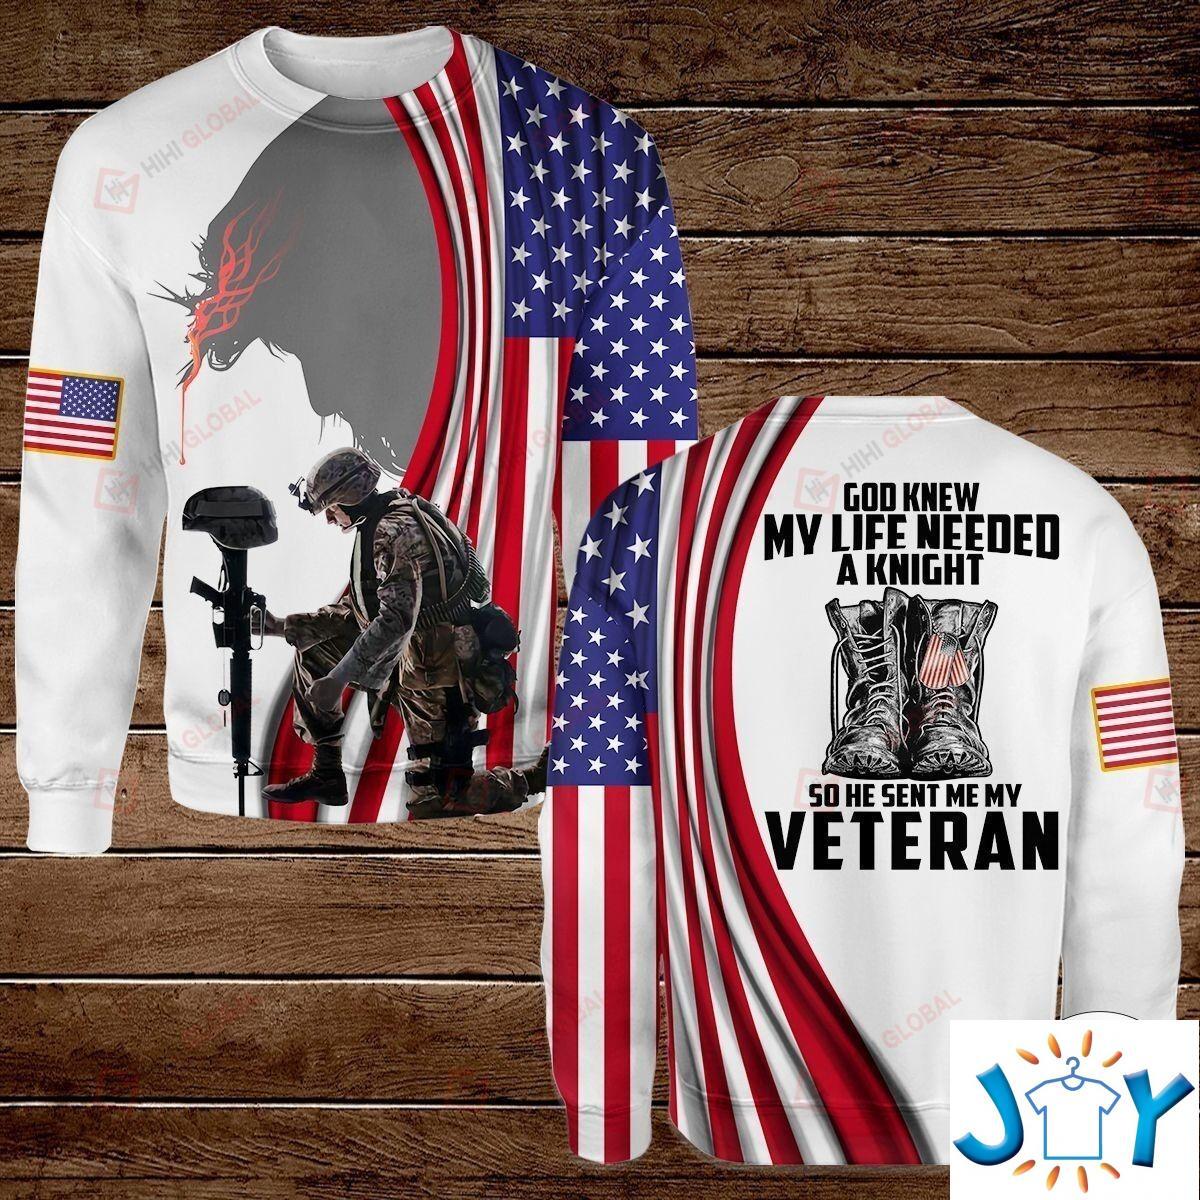 God Knew My Life Needed A Knight So He Sent Me My Veteran American Flag 3D Hoodies, Sweatshirt, Hawaiian Shirt